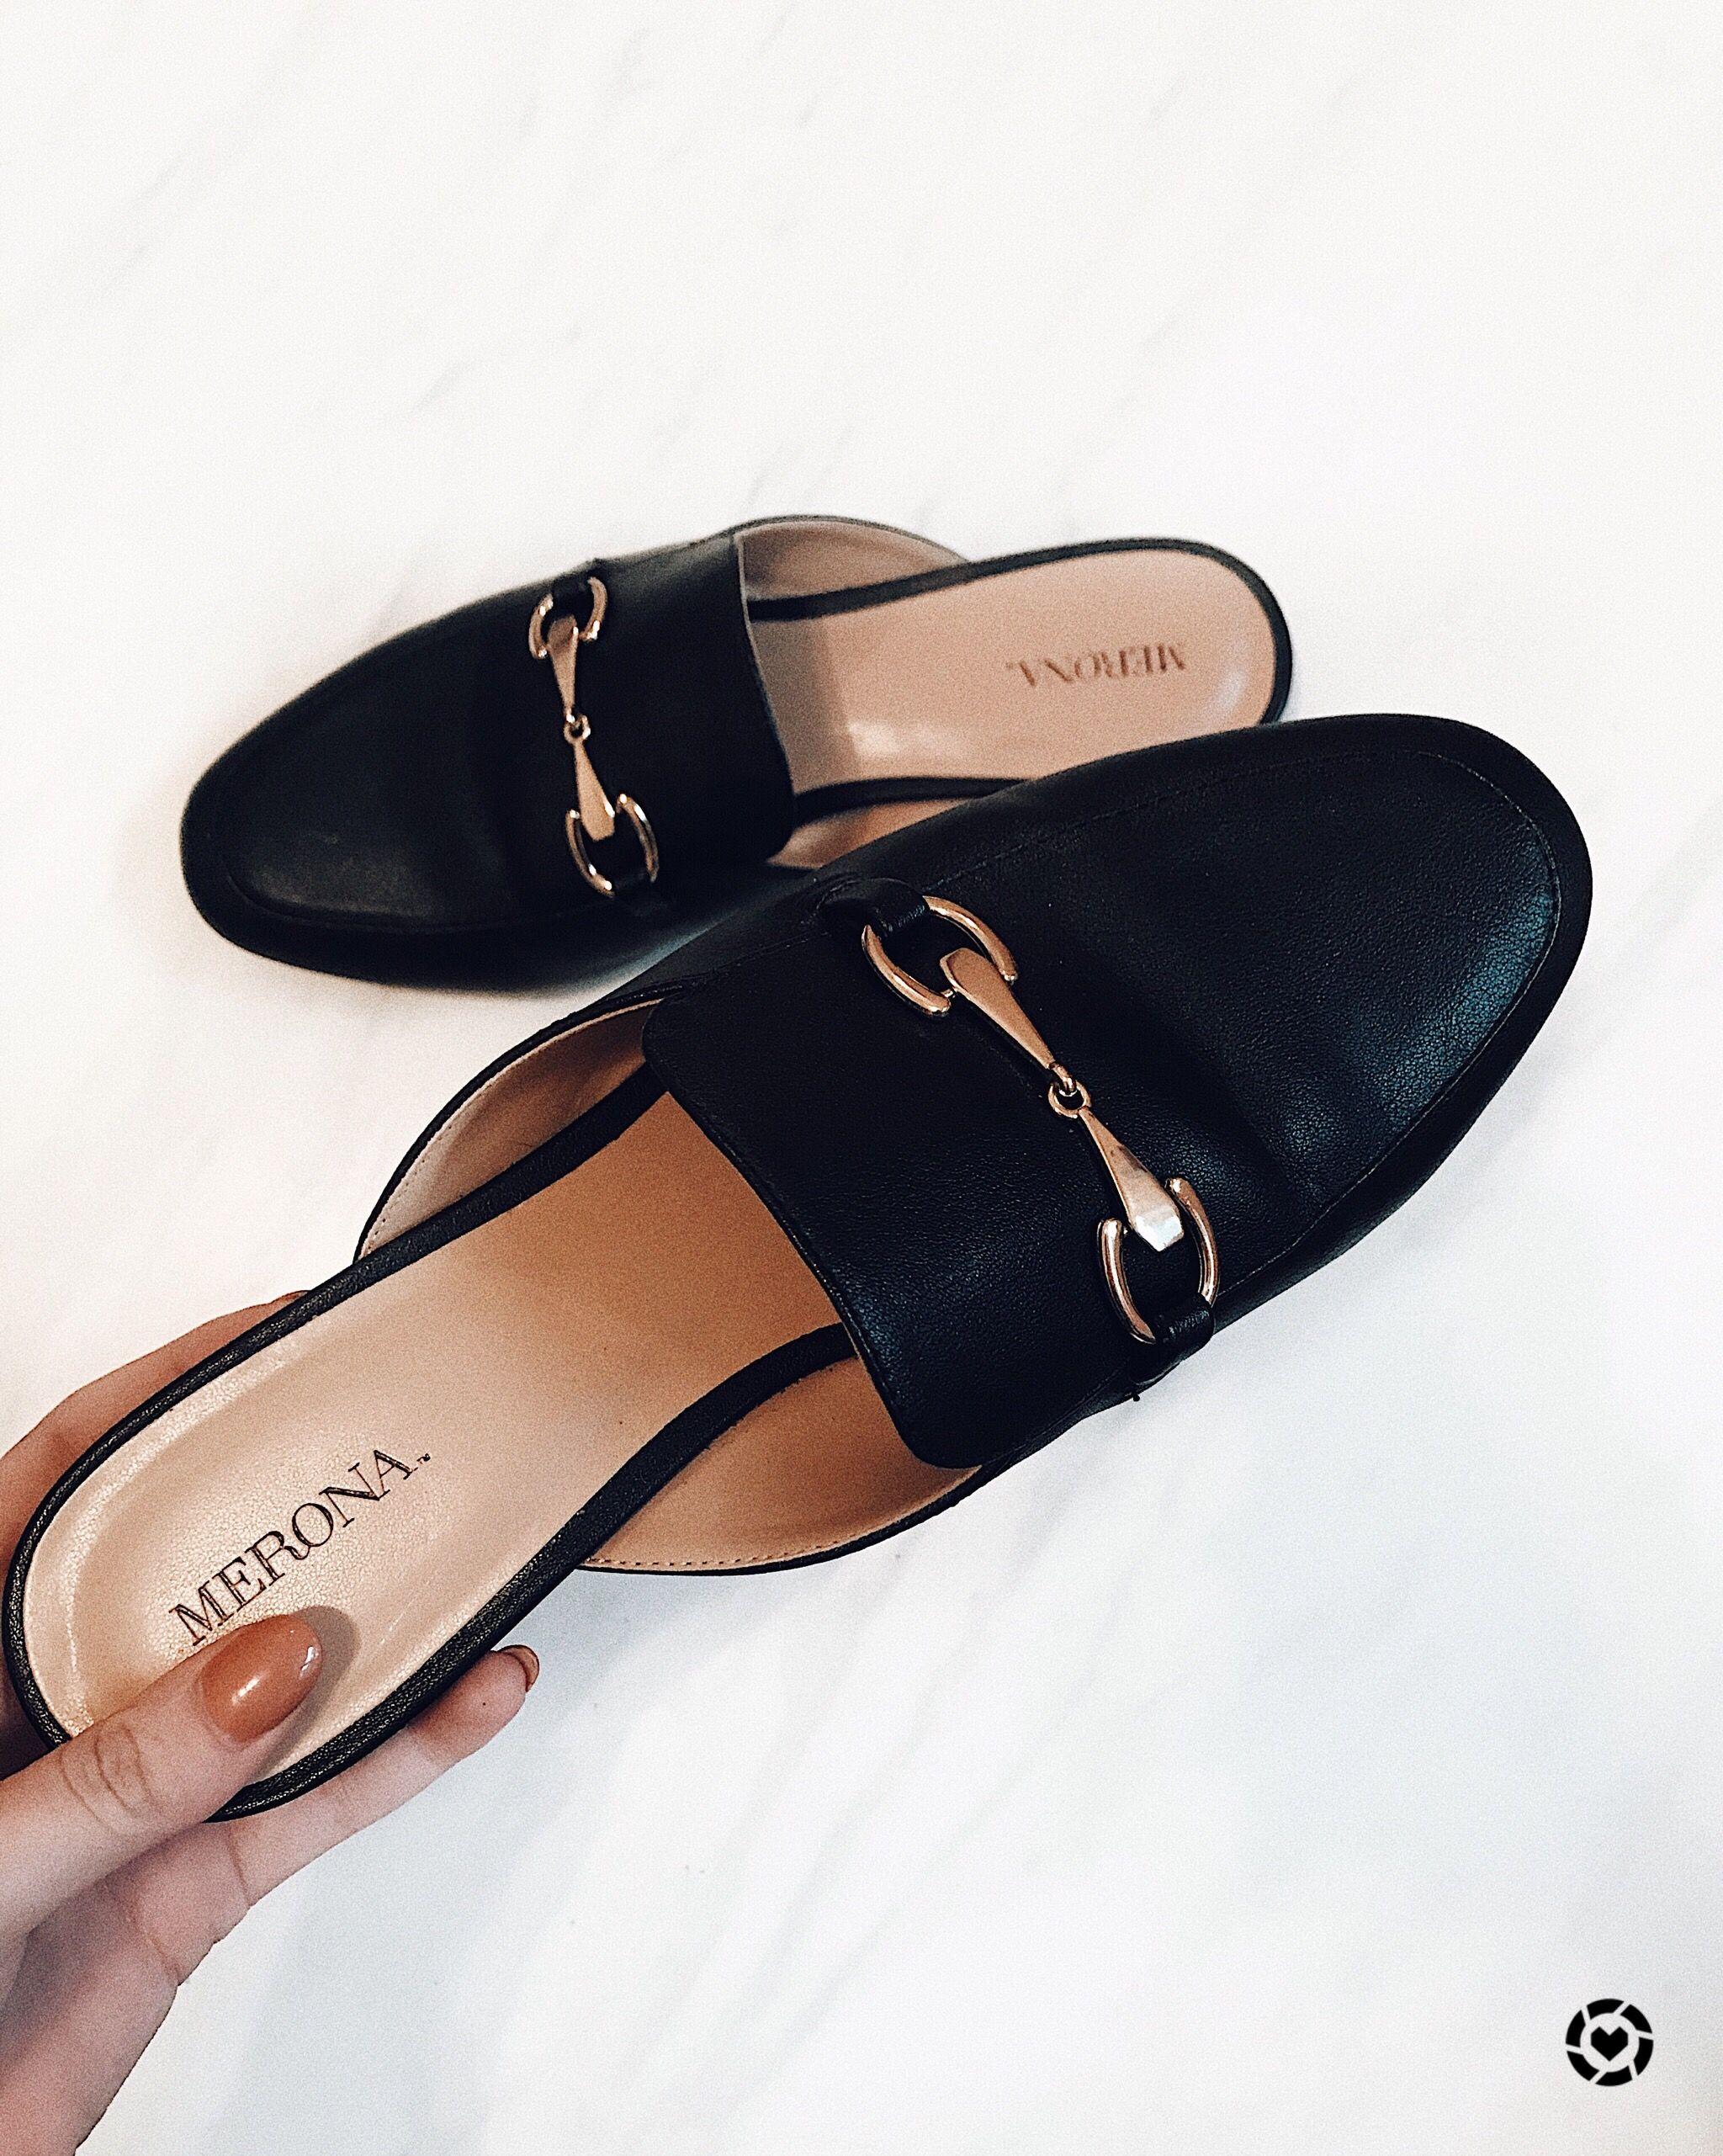 shoes comfortable cougar men comforter stylish shoe mens dark loafer jeans burgundy s online platini dsc